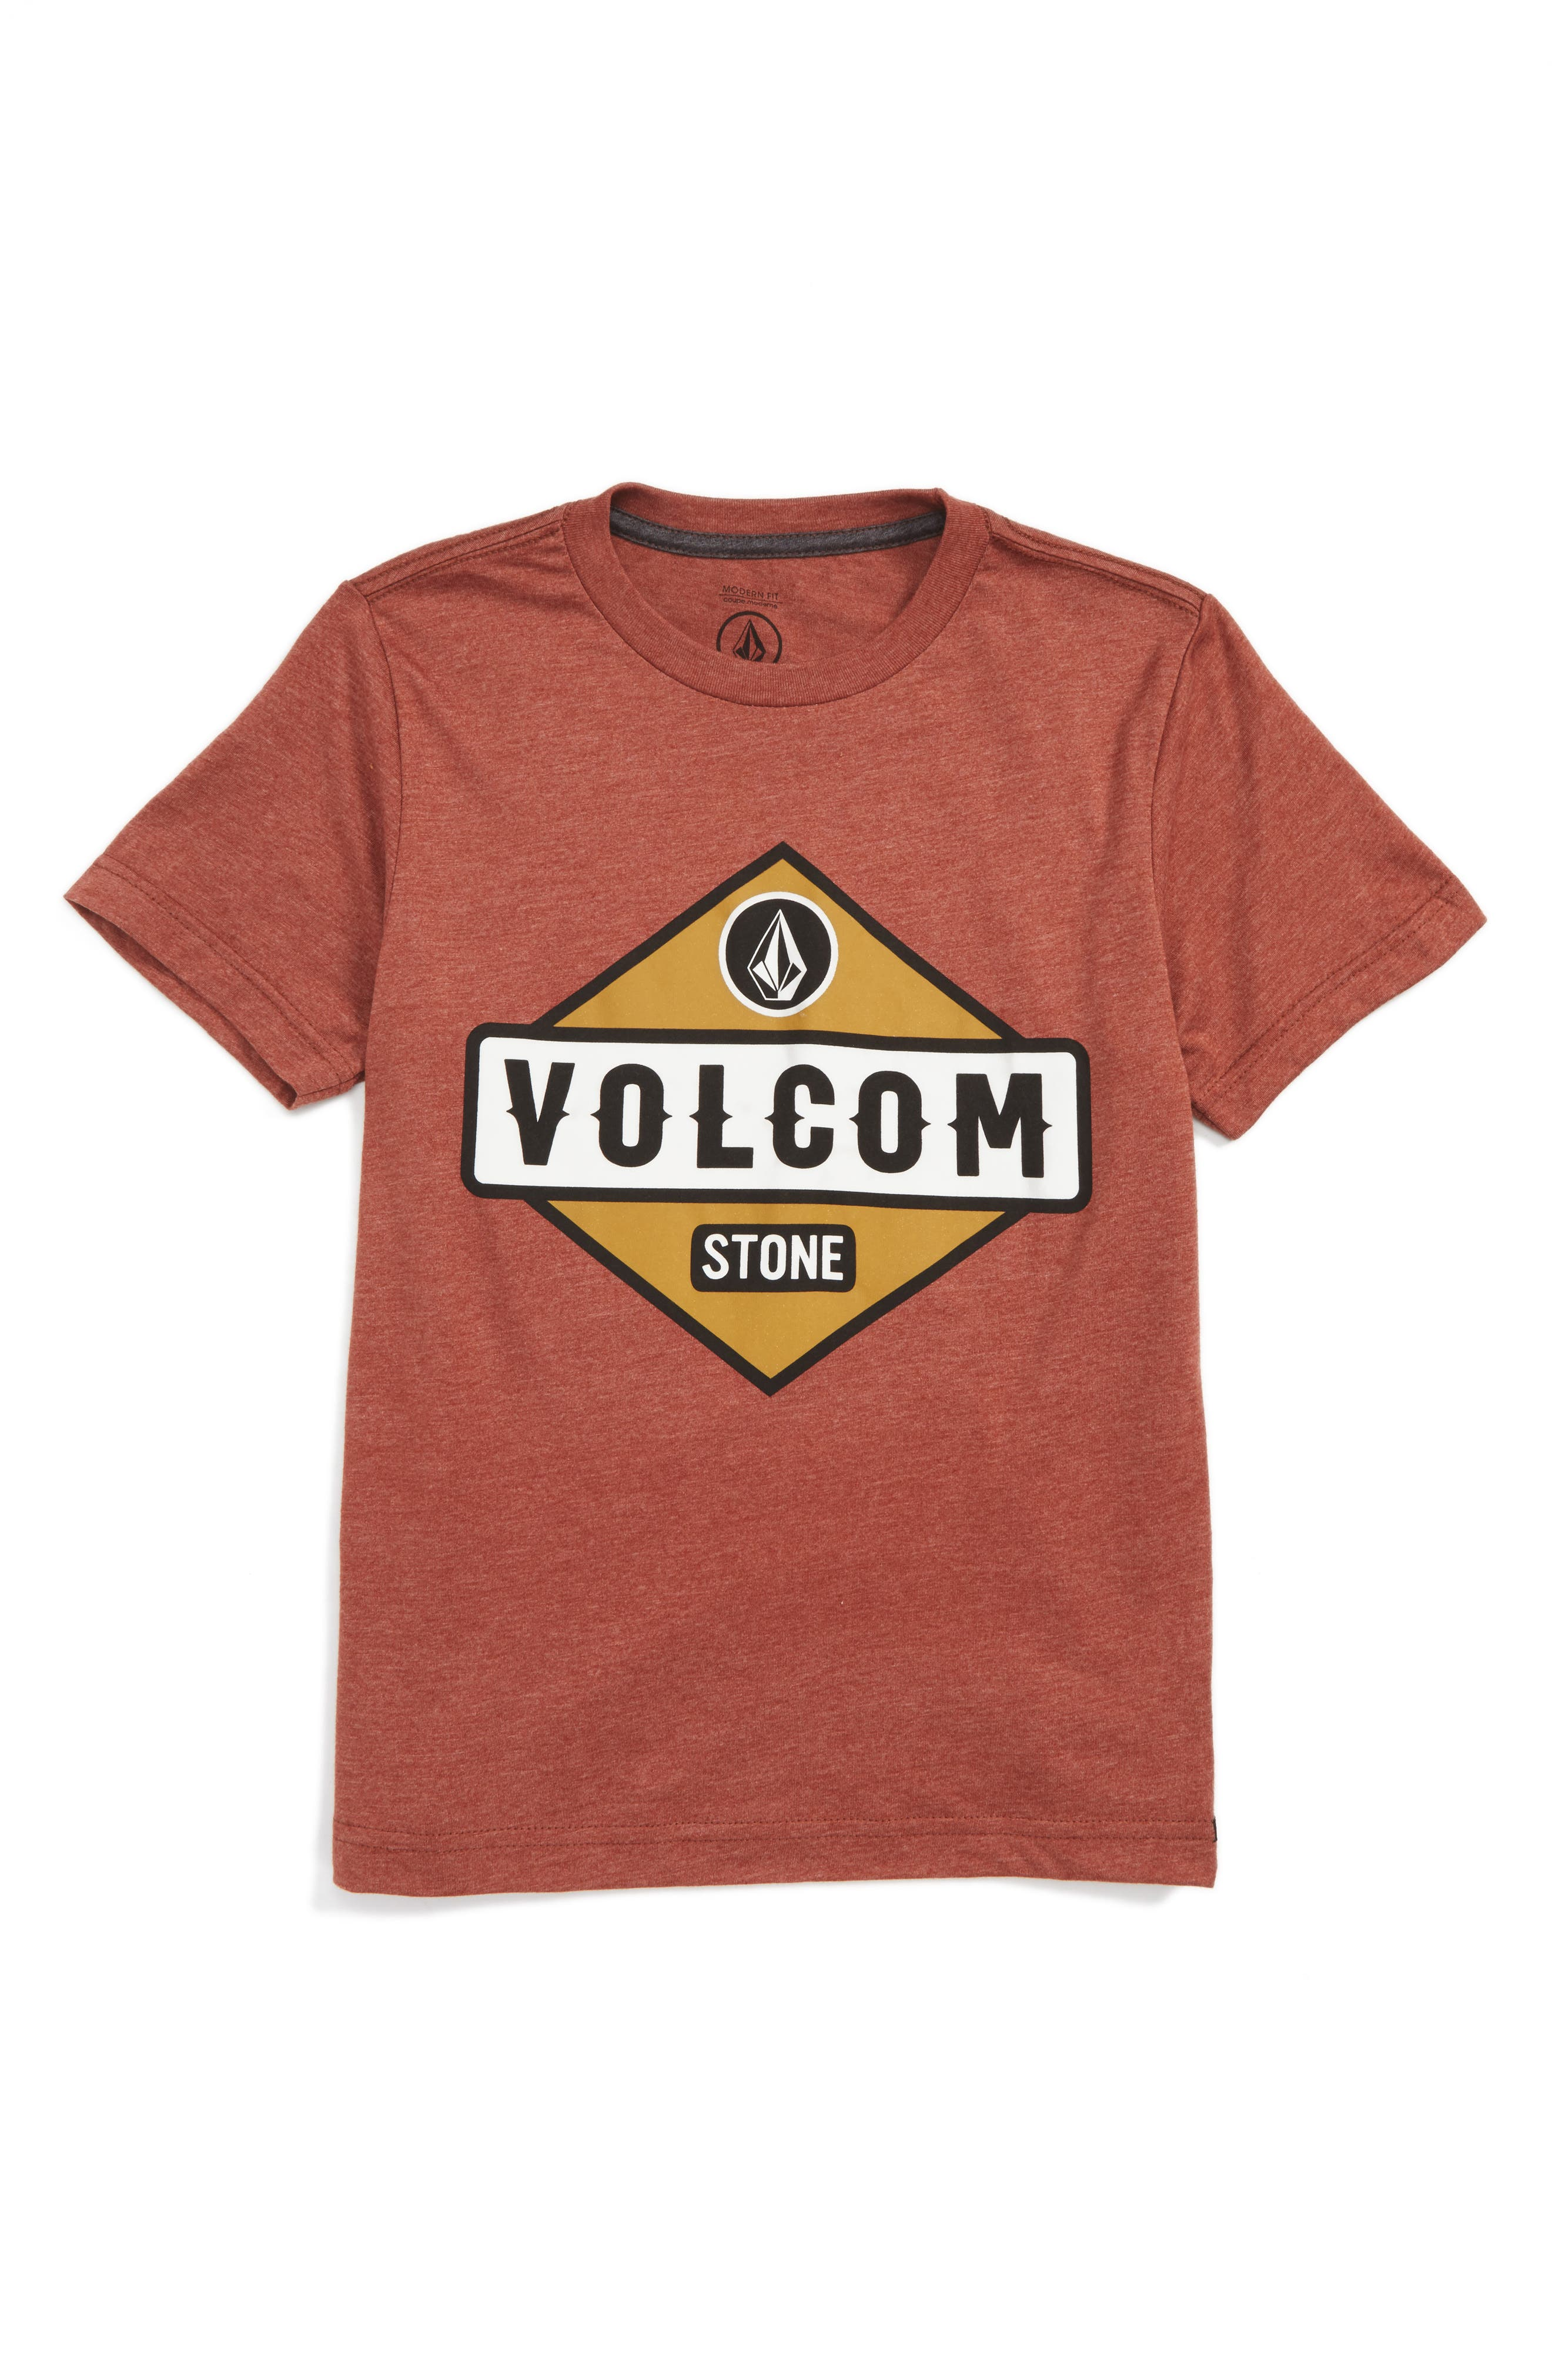 Volcom Caution T-Shirt (Toddler Boys, Little Boys & Big Boys)